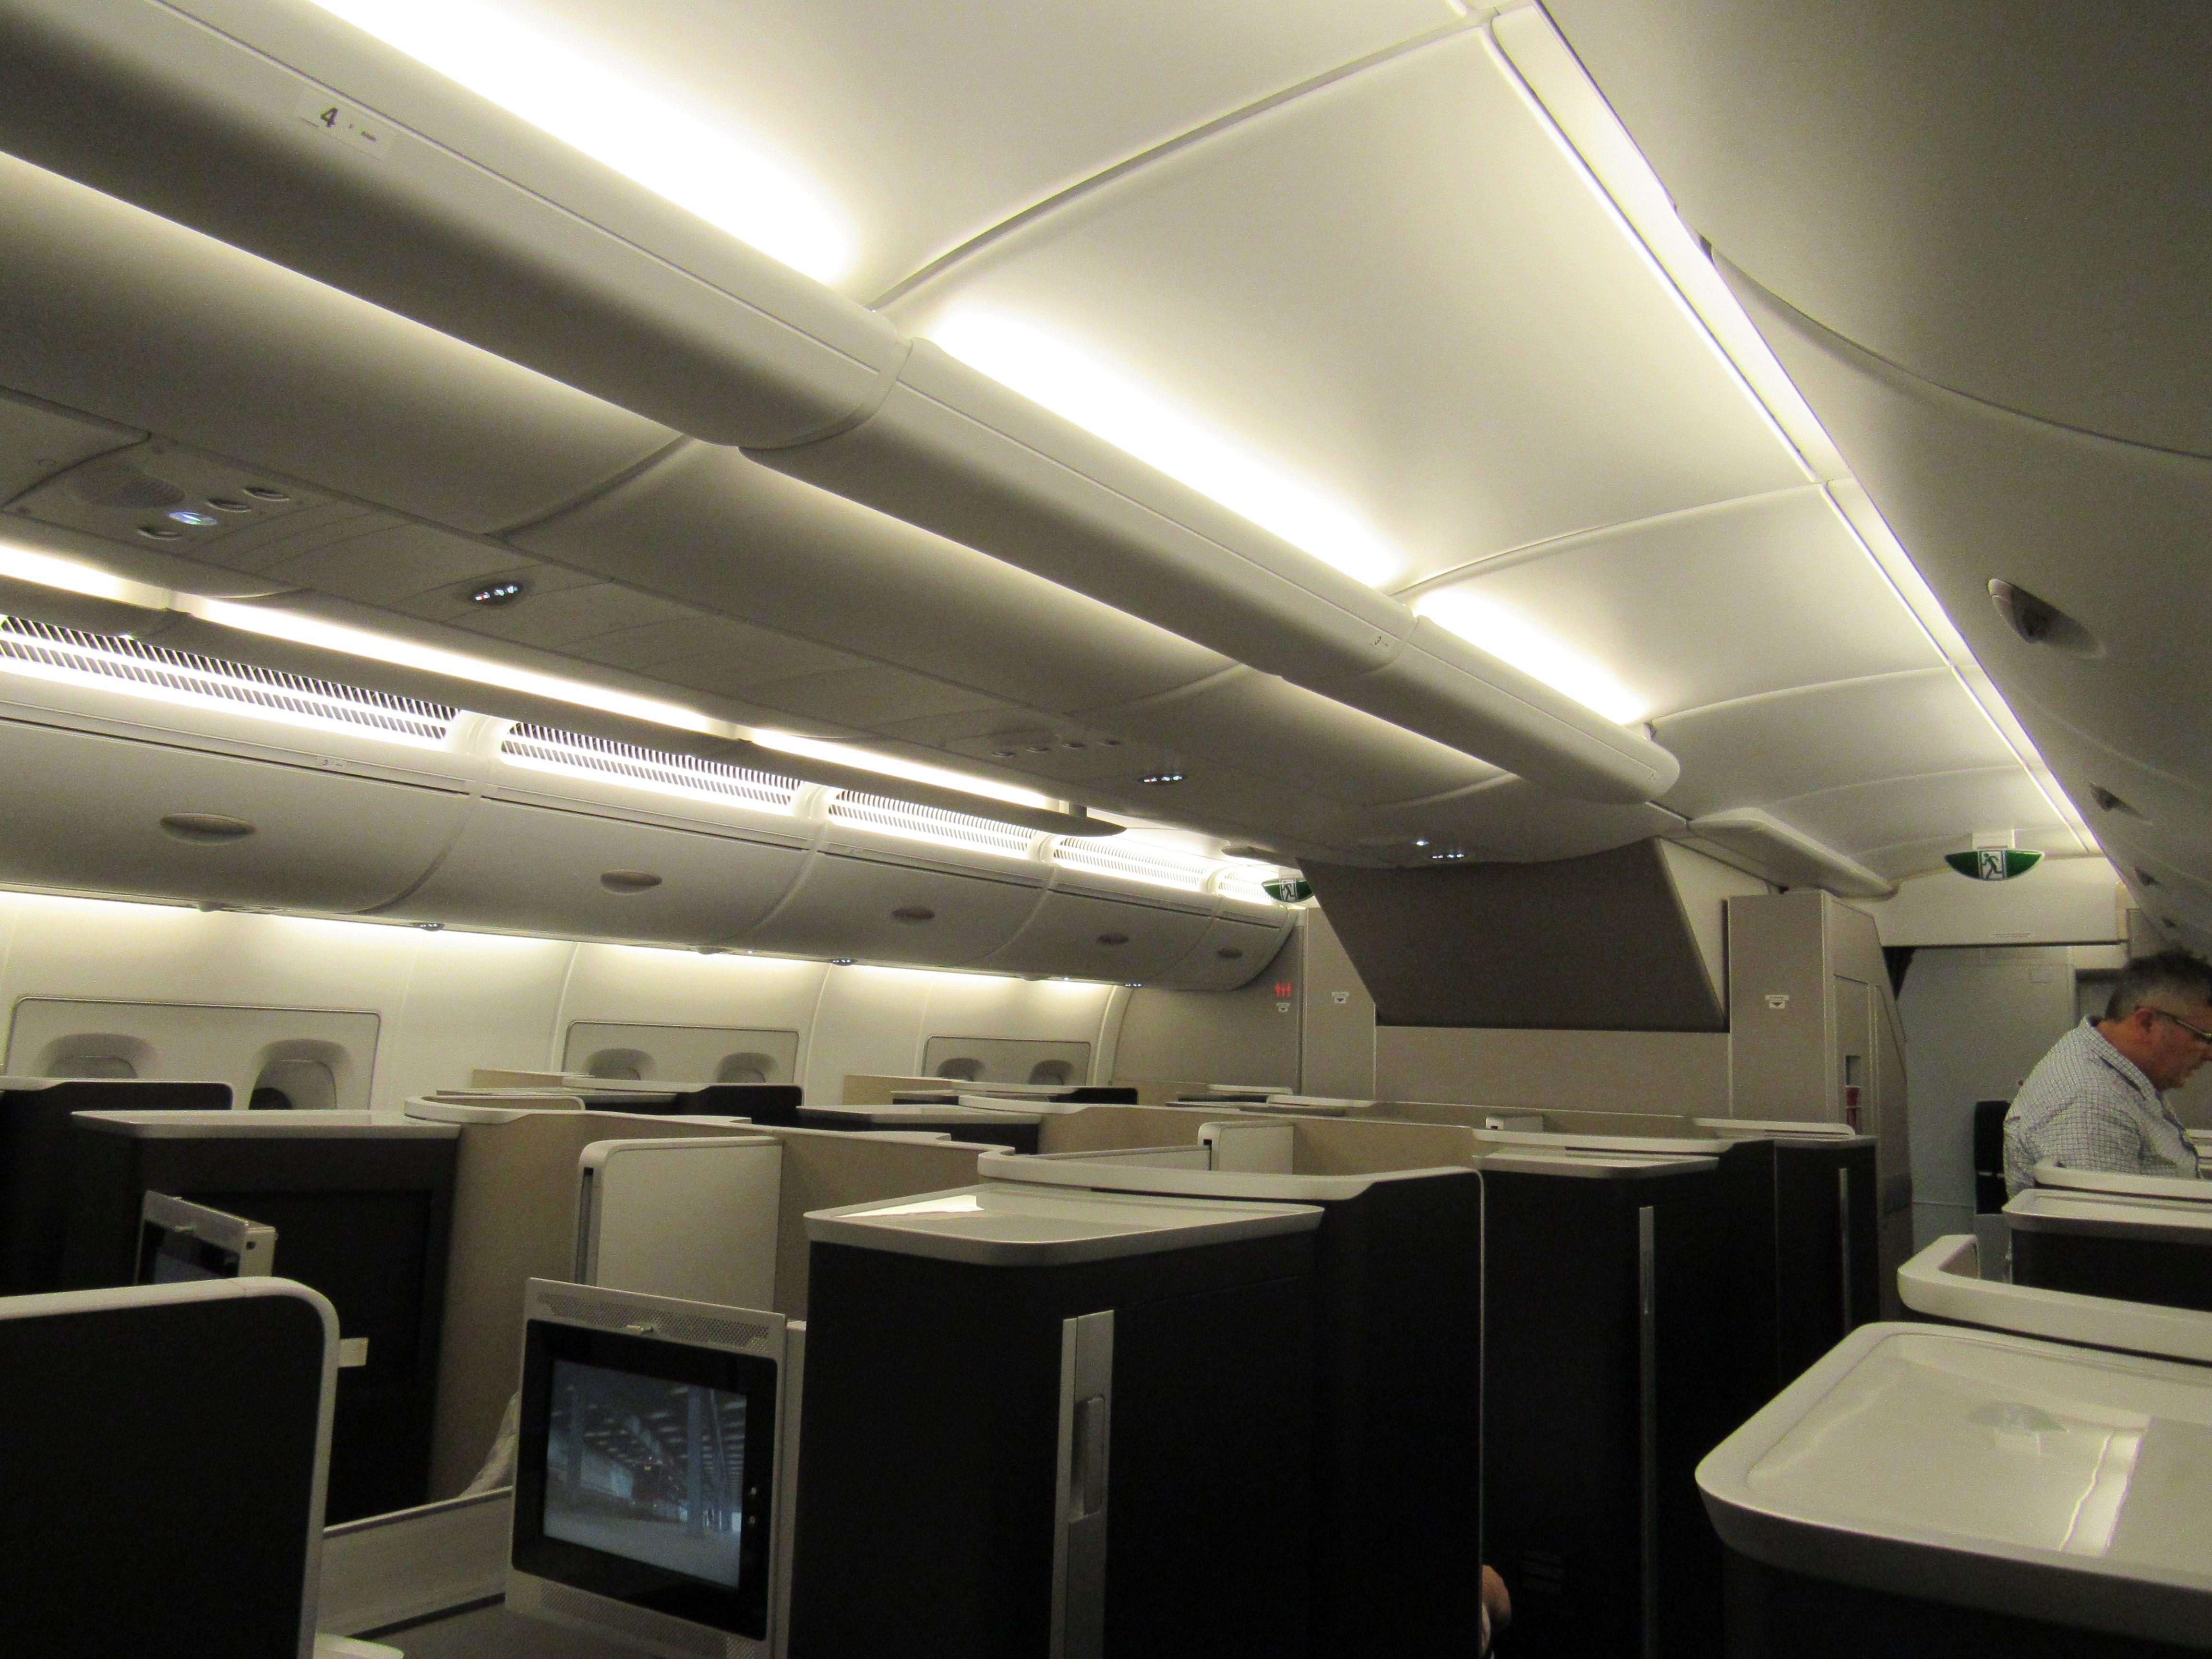 British airways first class johannesburglondon review in